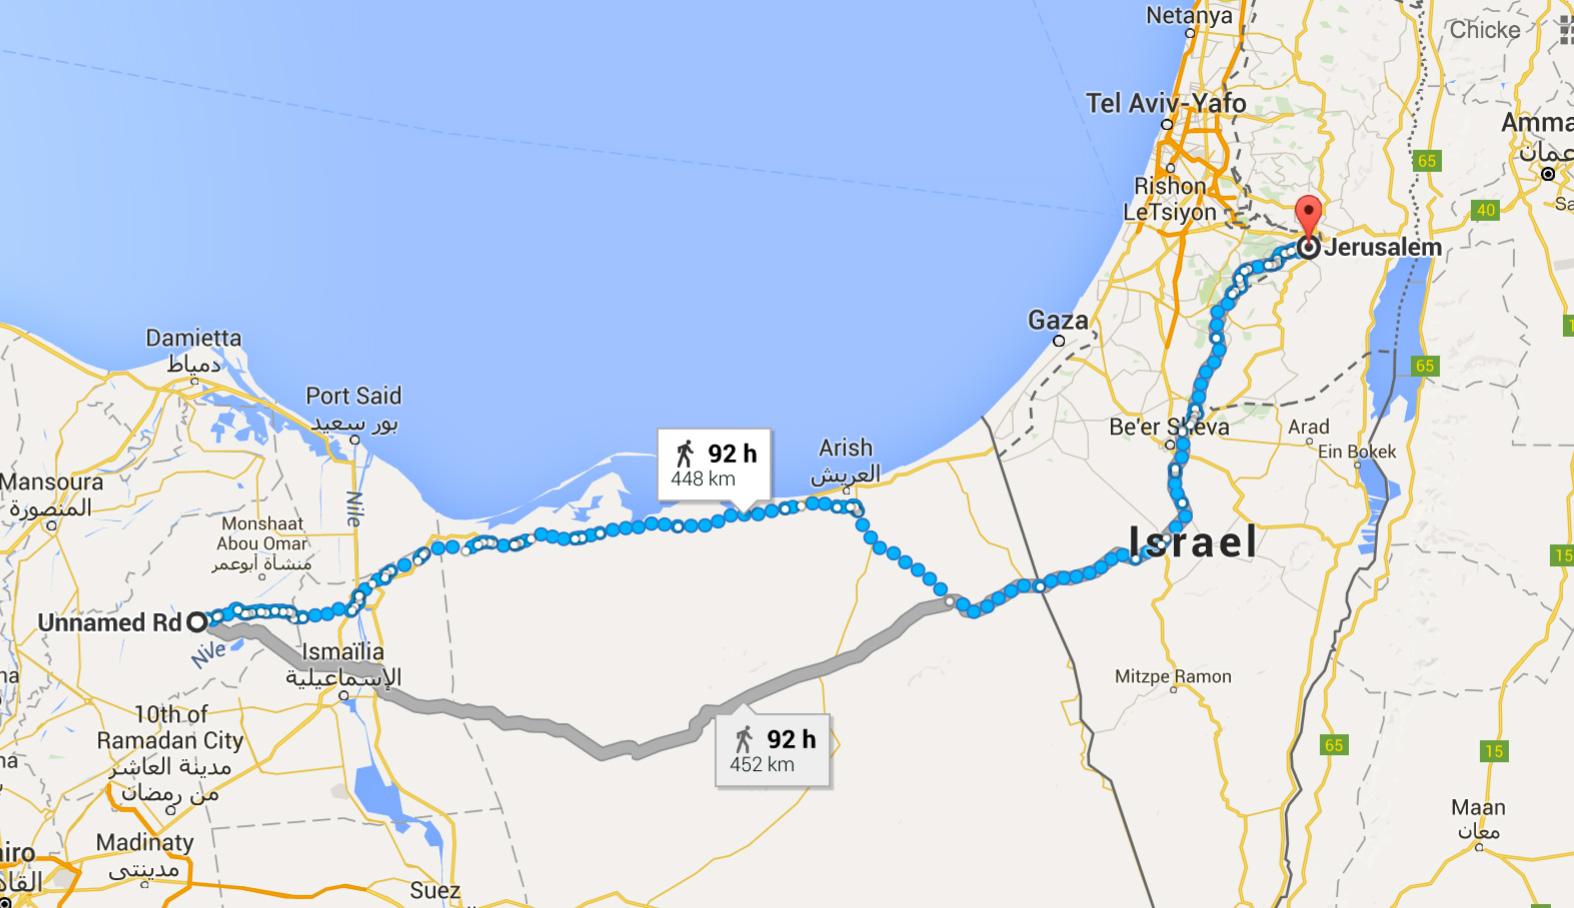 Exodus - Way of the Sea